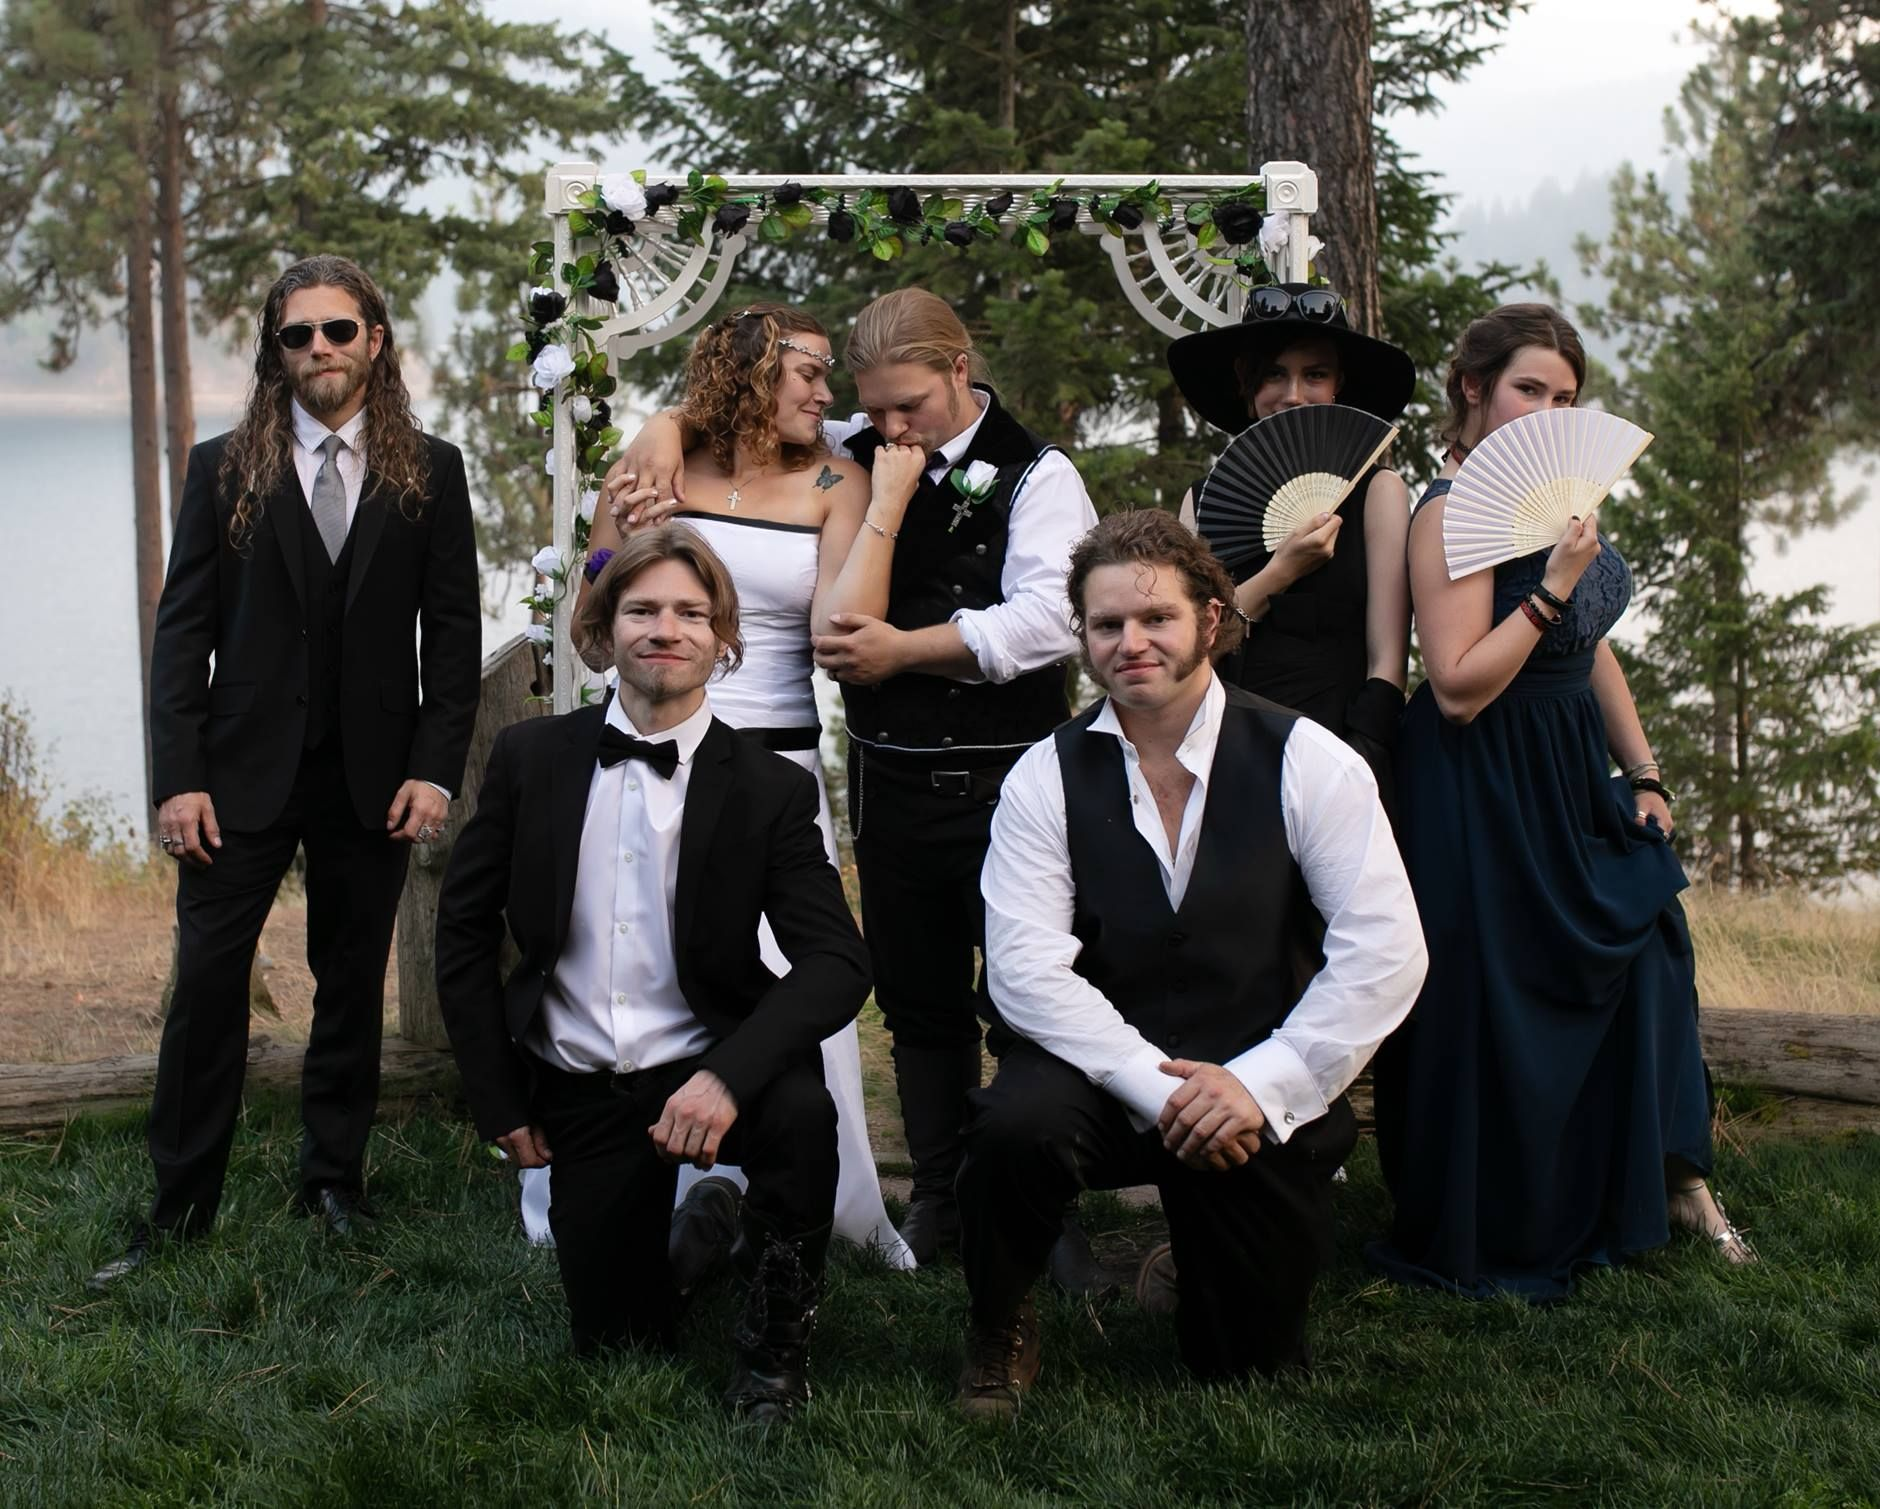 Noah Got Married Alaskan Bush People Alaskan Matt Brown